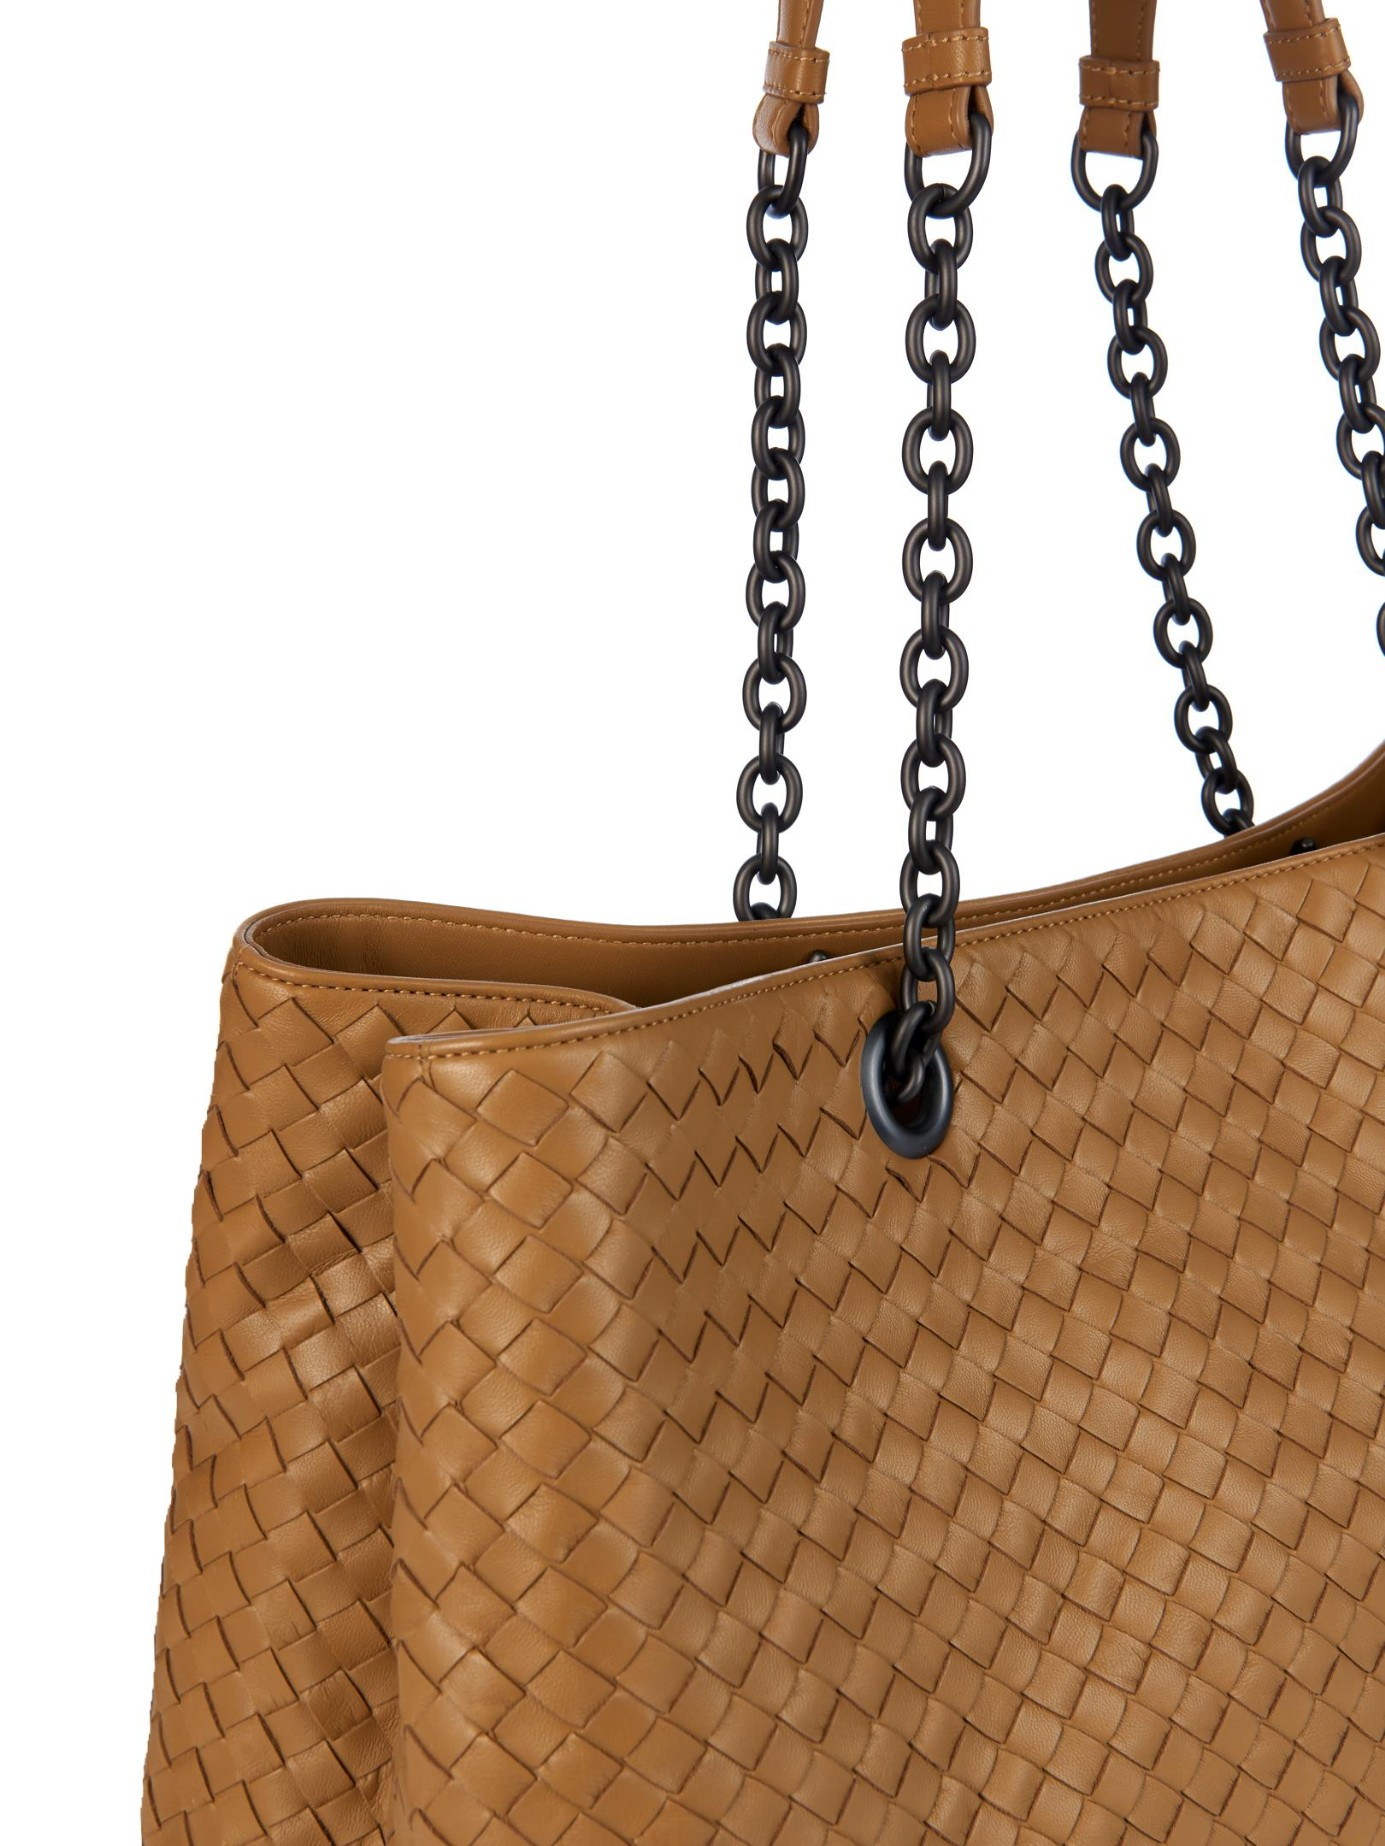 91afffc45efe Lyst - Bottega Veneta Intrecciato Double-handle Leather Tote in Natural